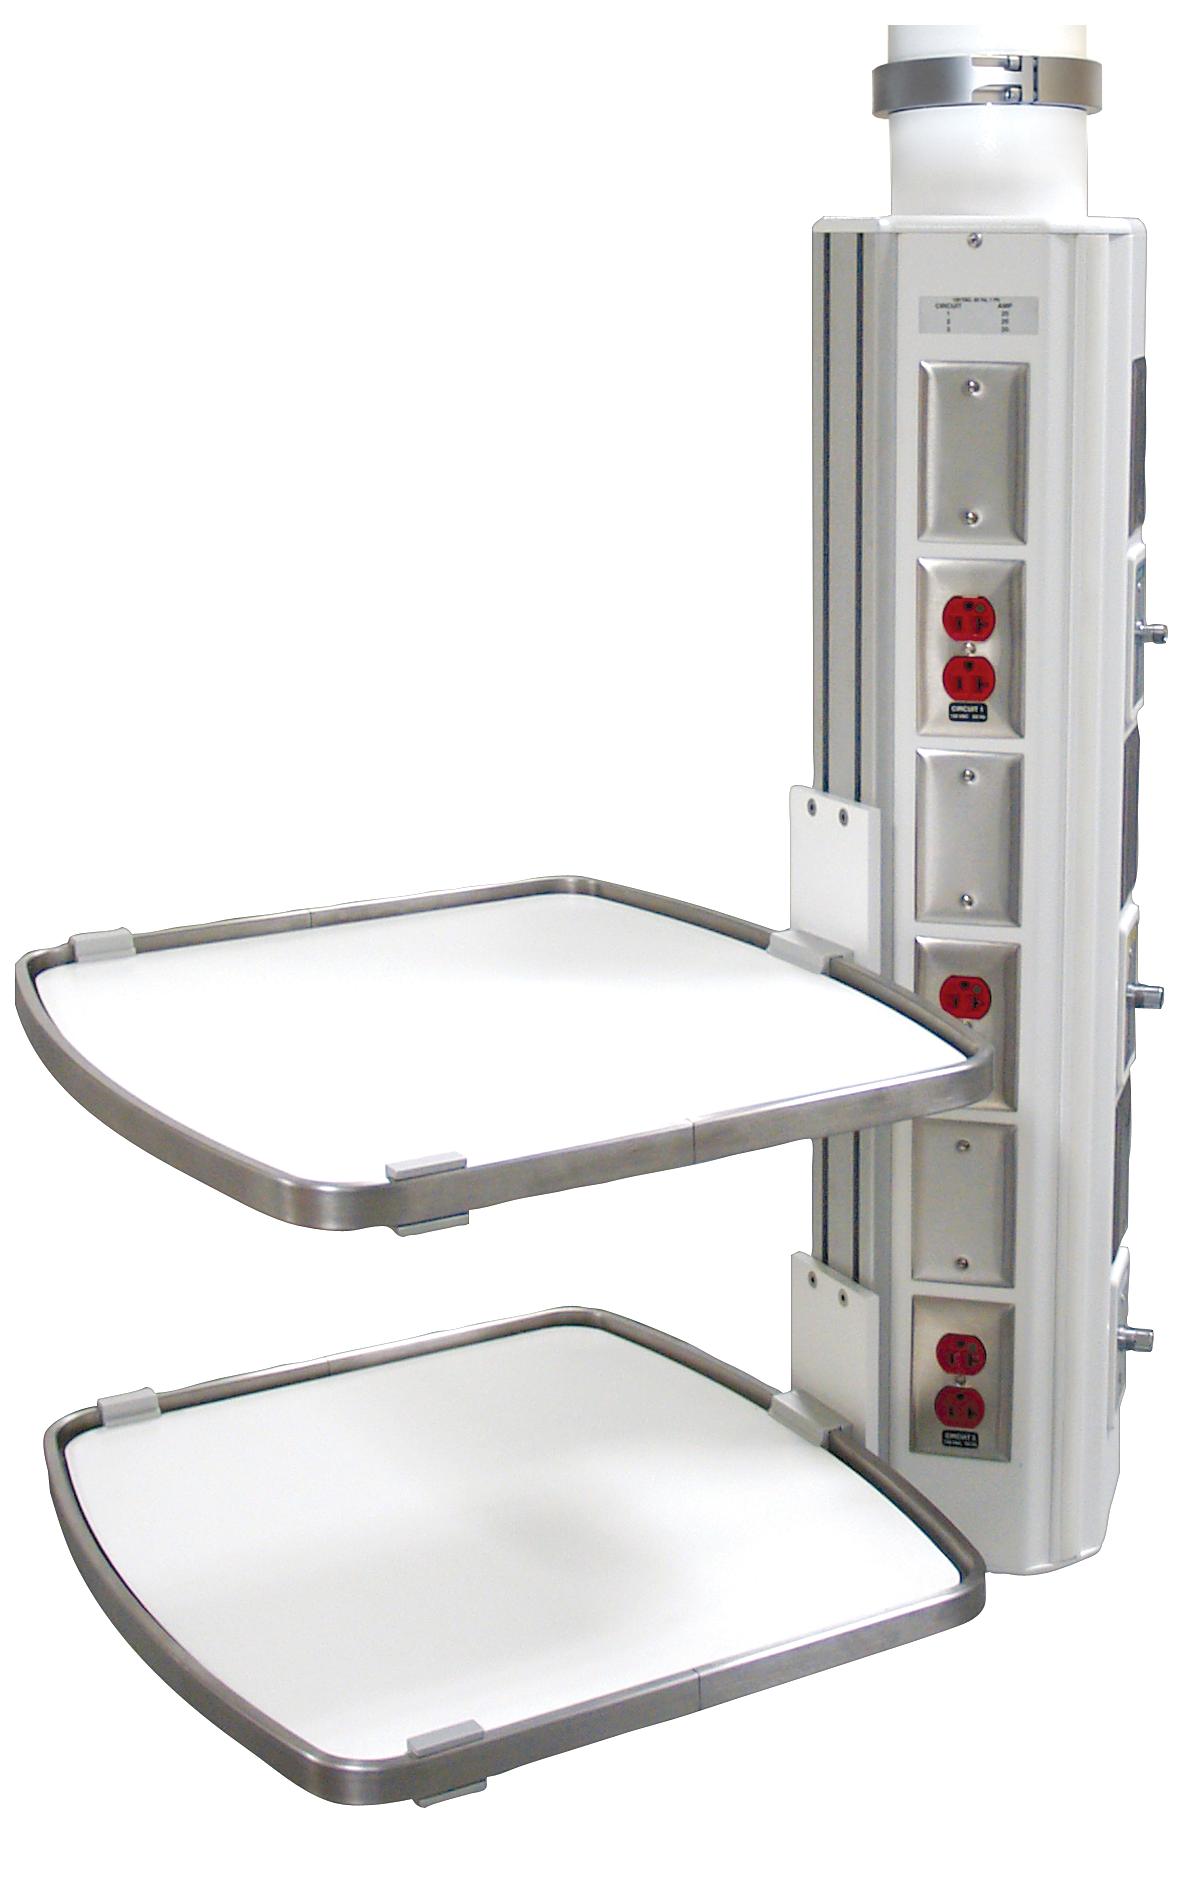 VBA-cantilever-shelves.png